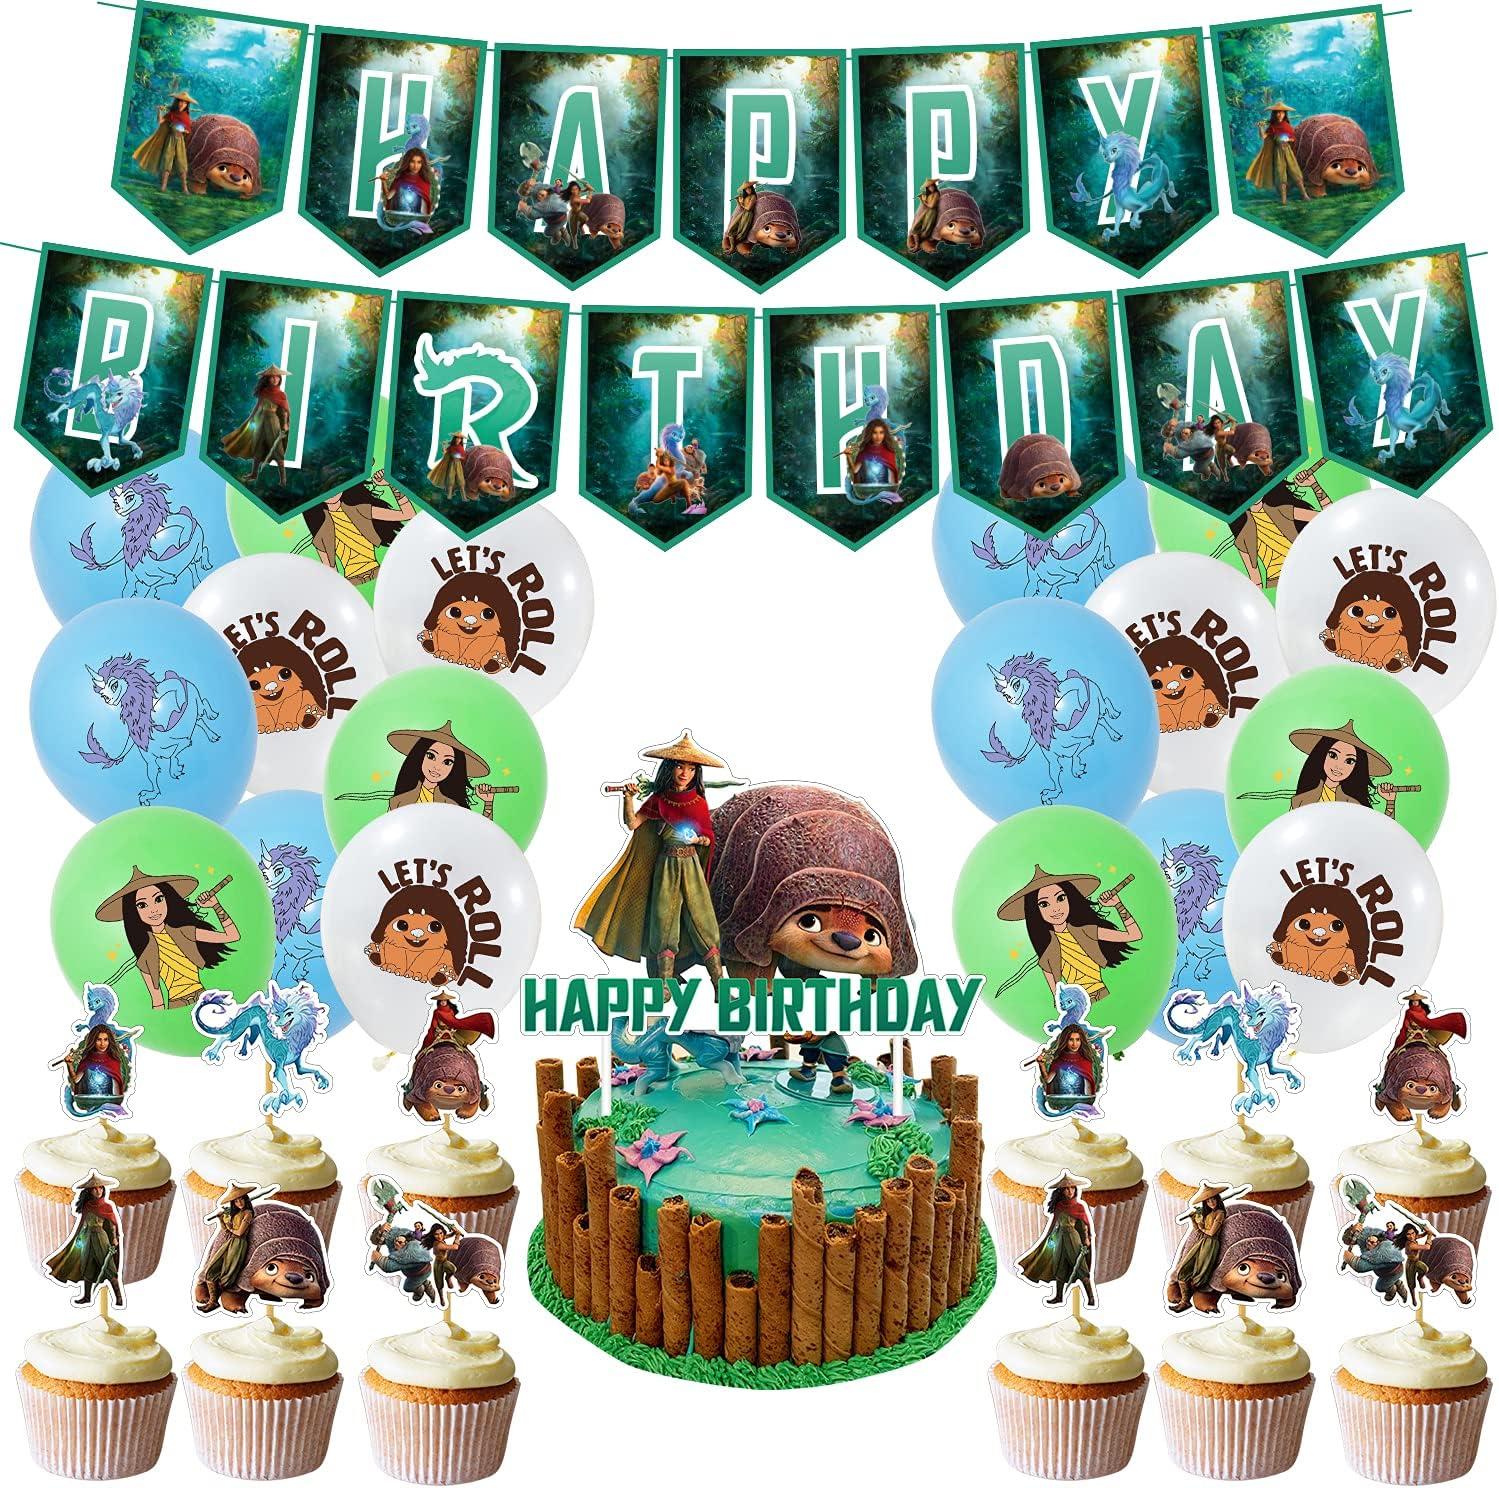 Raya Birthday Decorations The Last Supplie 1 year warranty Dragon Party Burthday OFFicial shop